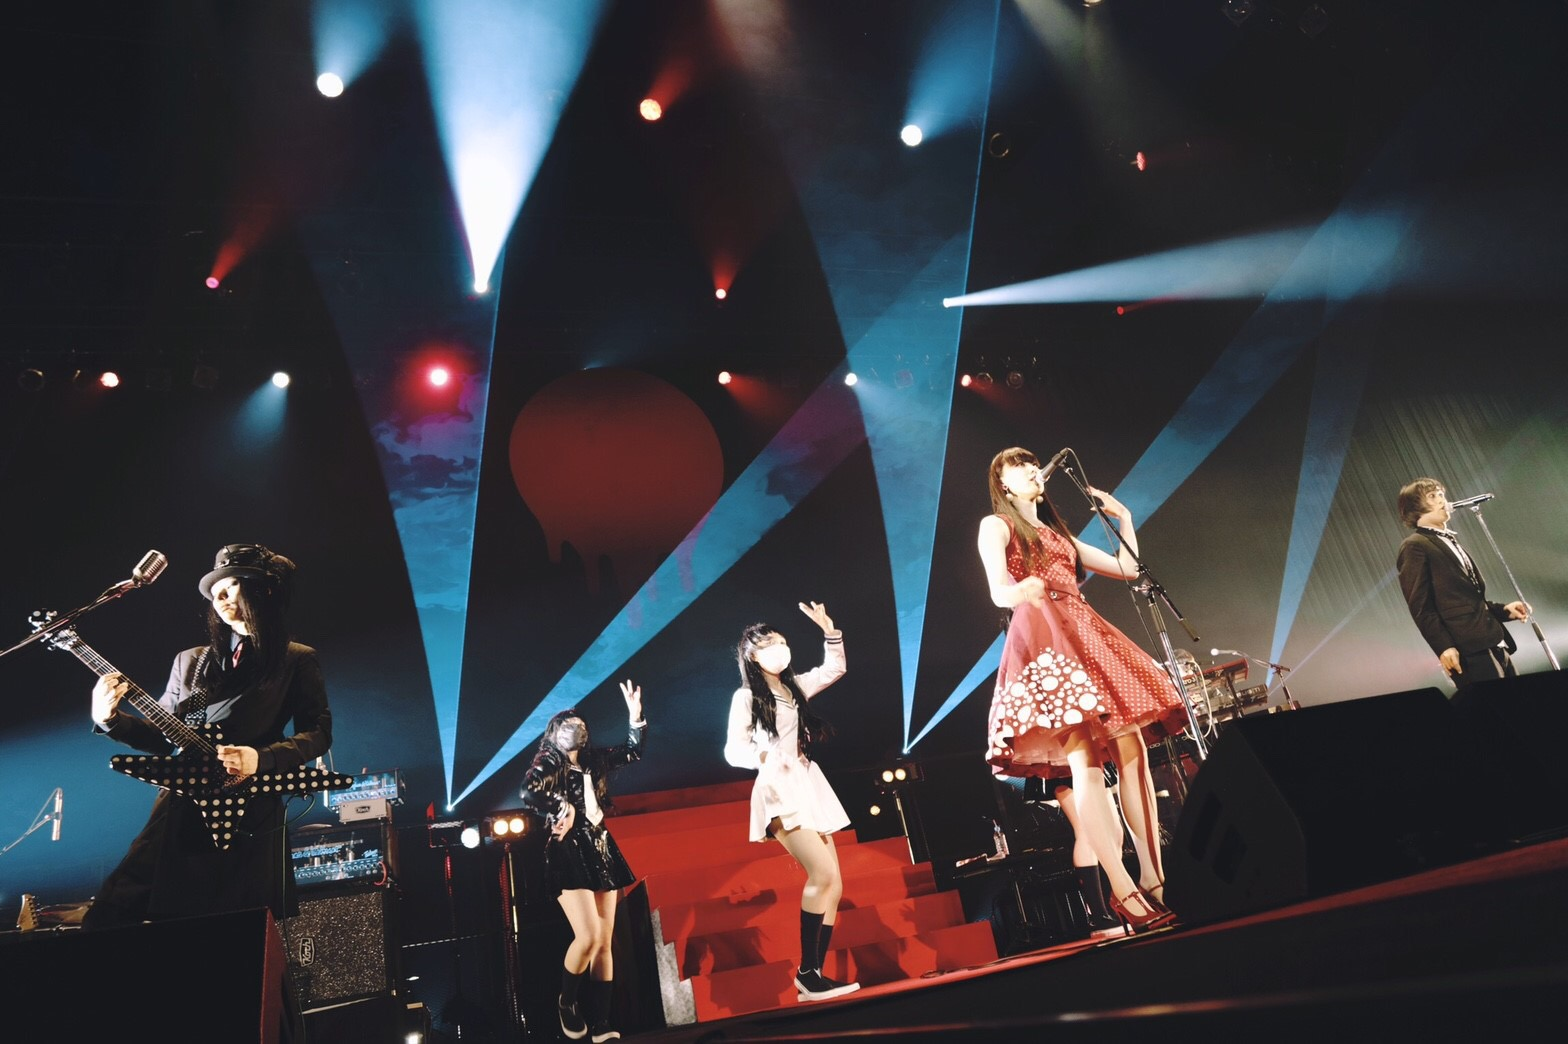 RMMS-URBANGARDE-Ai-to-Gensou-no-URBANGARDE-announce8-Kekkon-Shiki-liveD